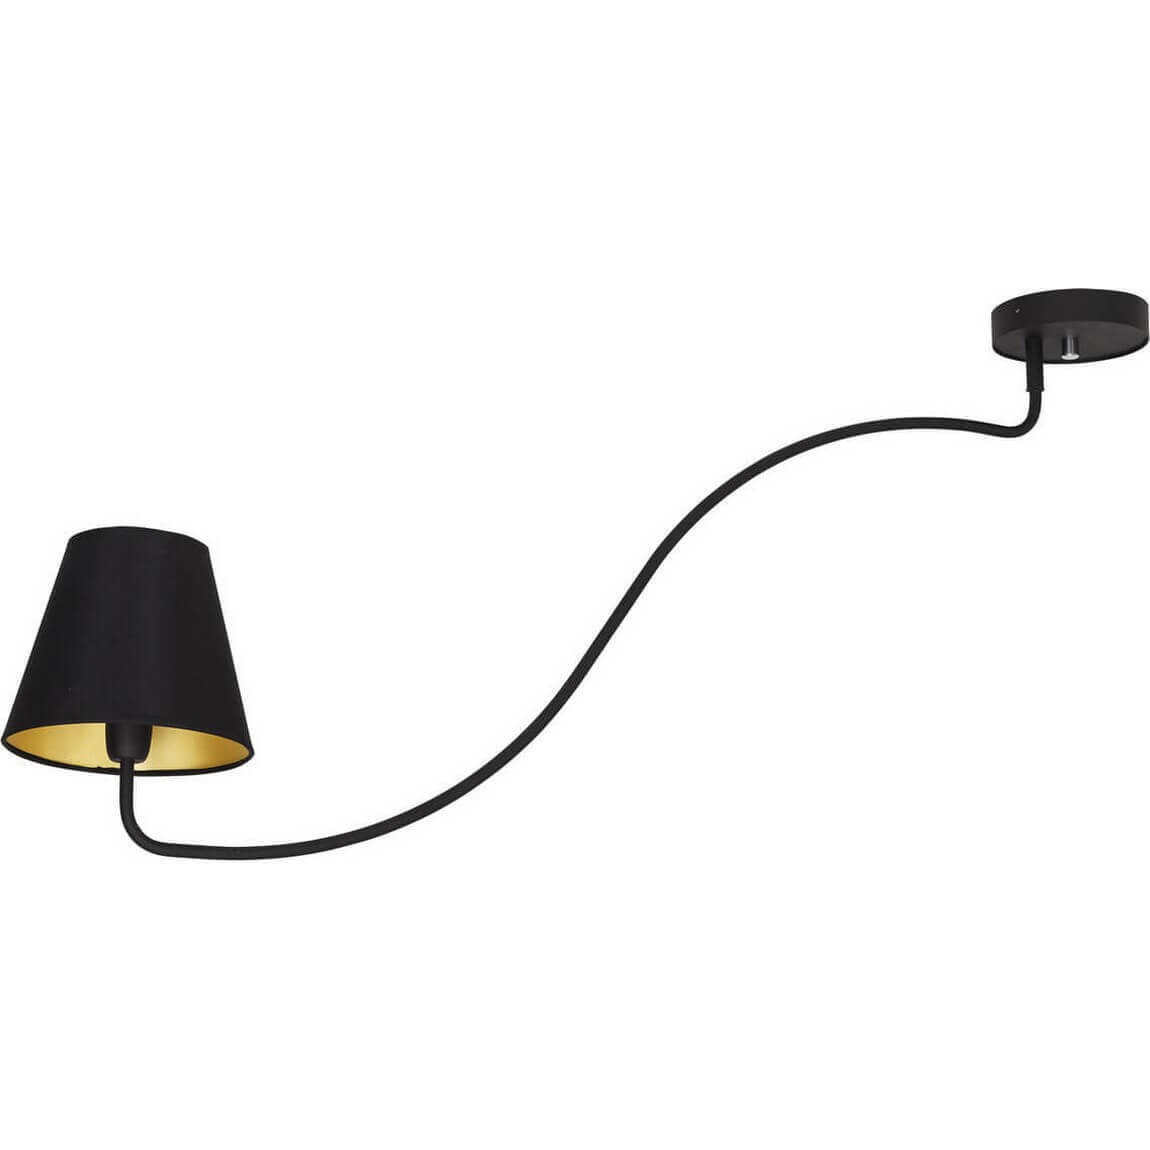 Подвесной светильник Nowodvorski Swivel 6556 nowodvorski swivel white iii plafon